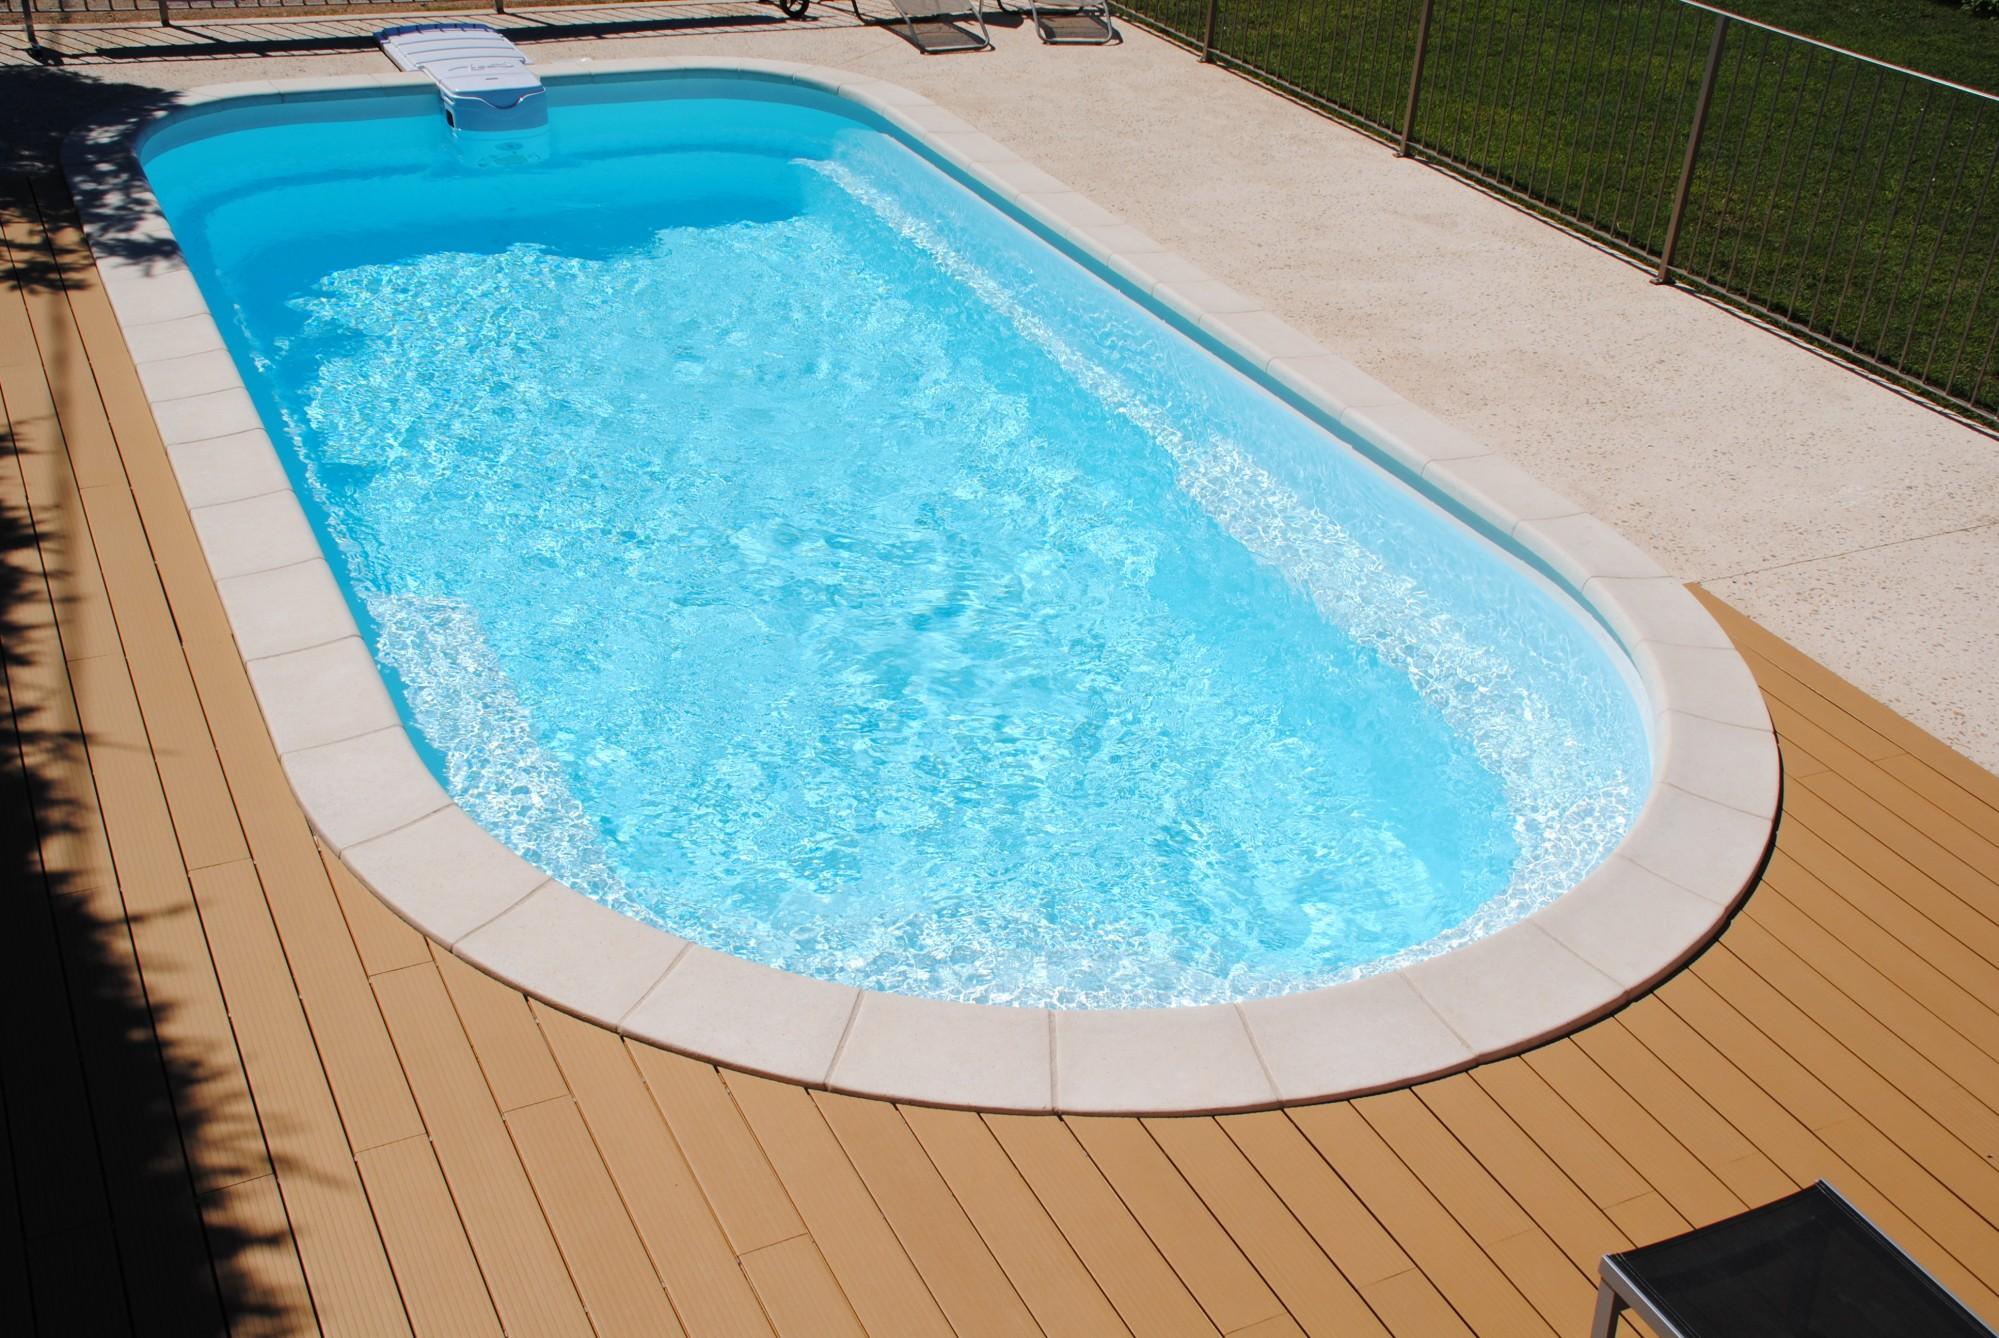 Vente de piscines axeo coque polyester marseille ferr for Bloc filtrant piscine